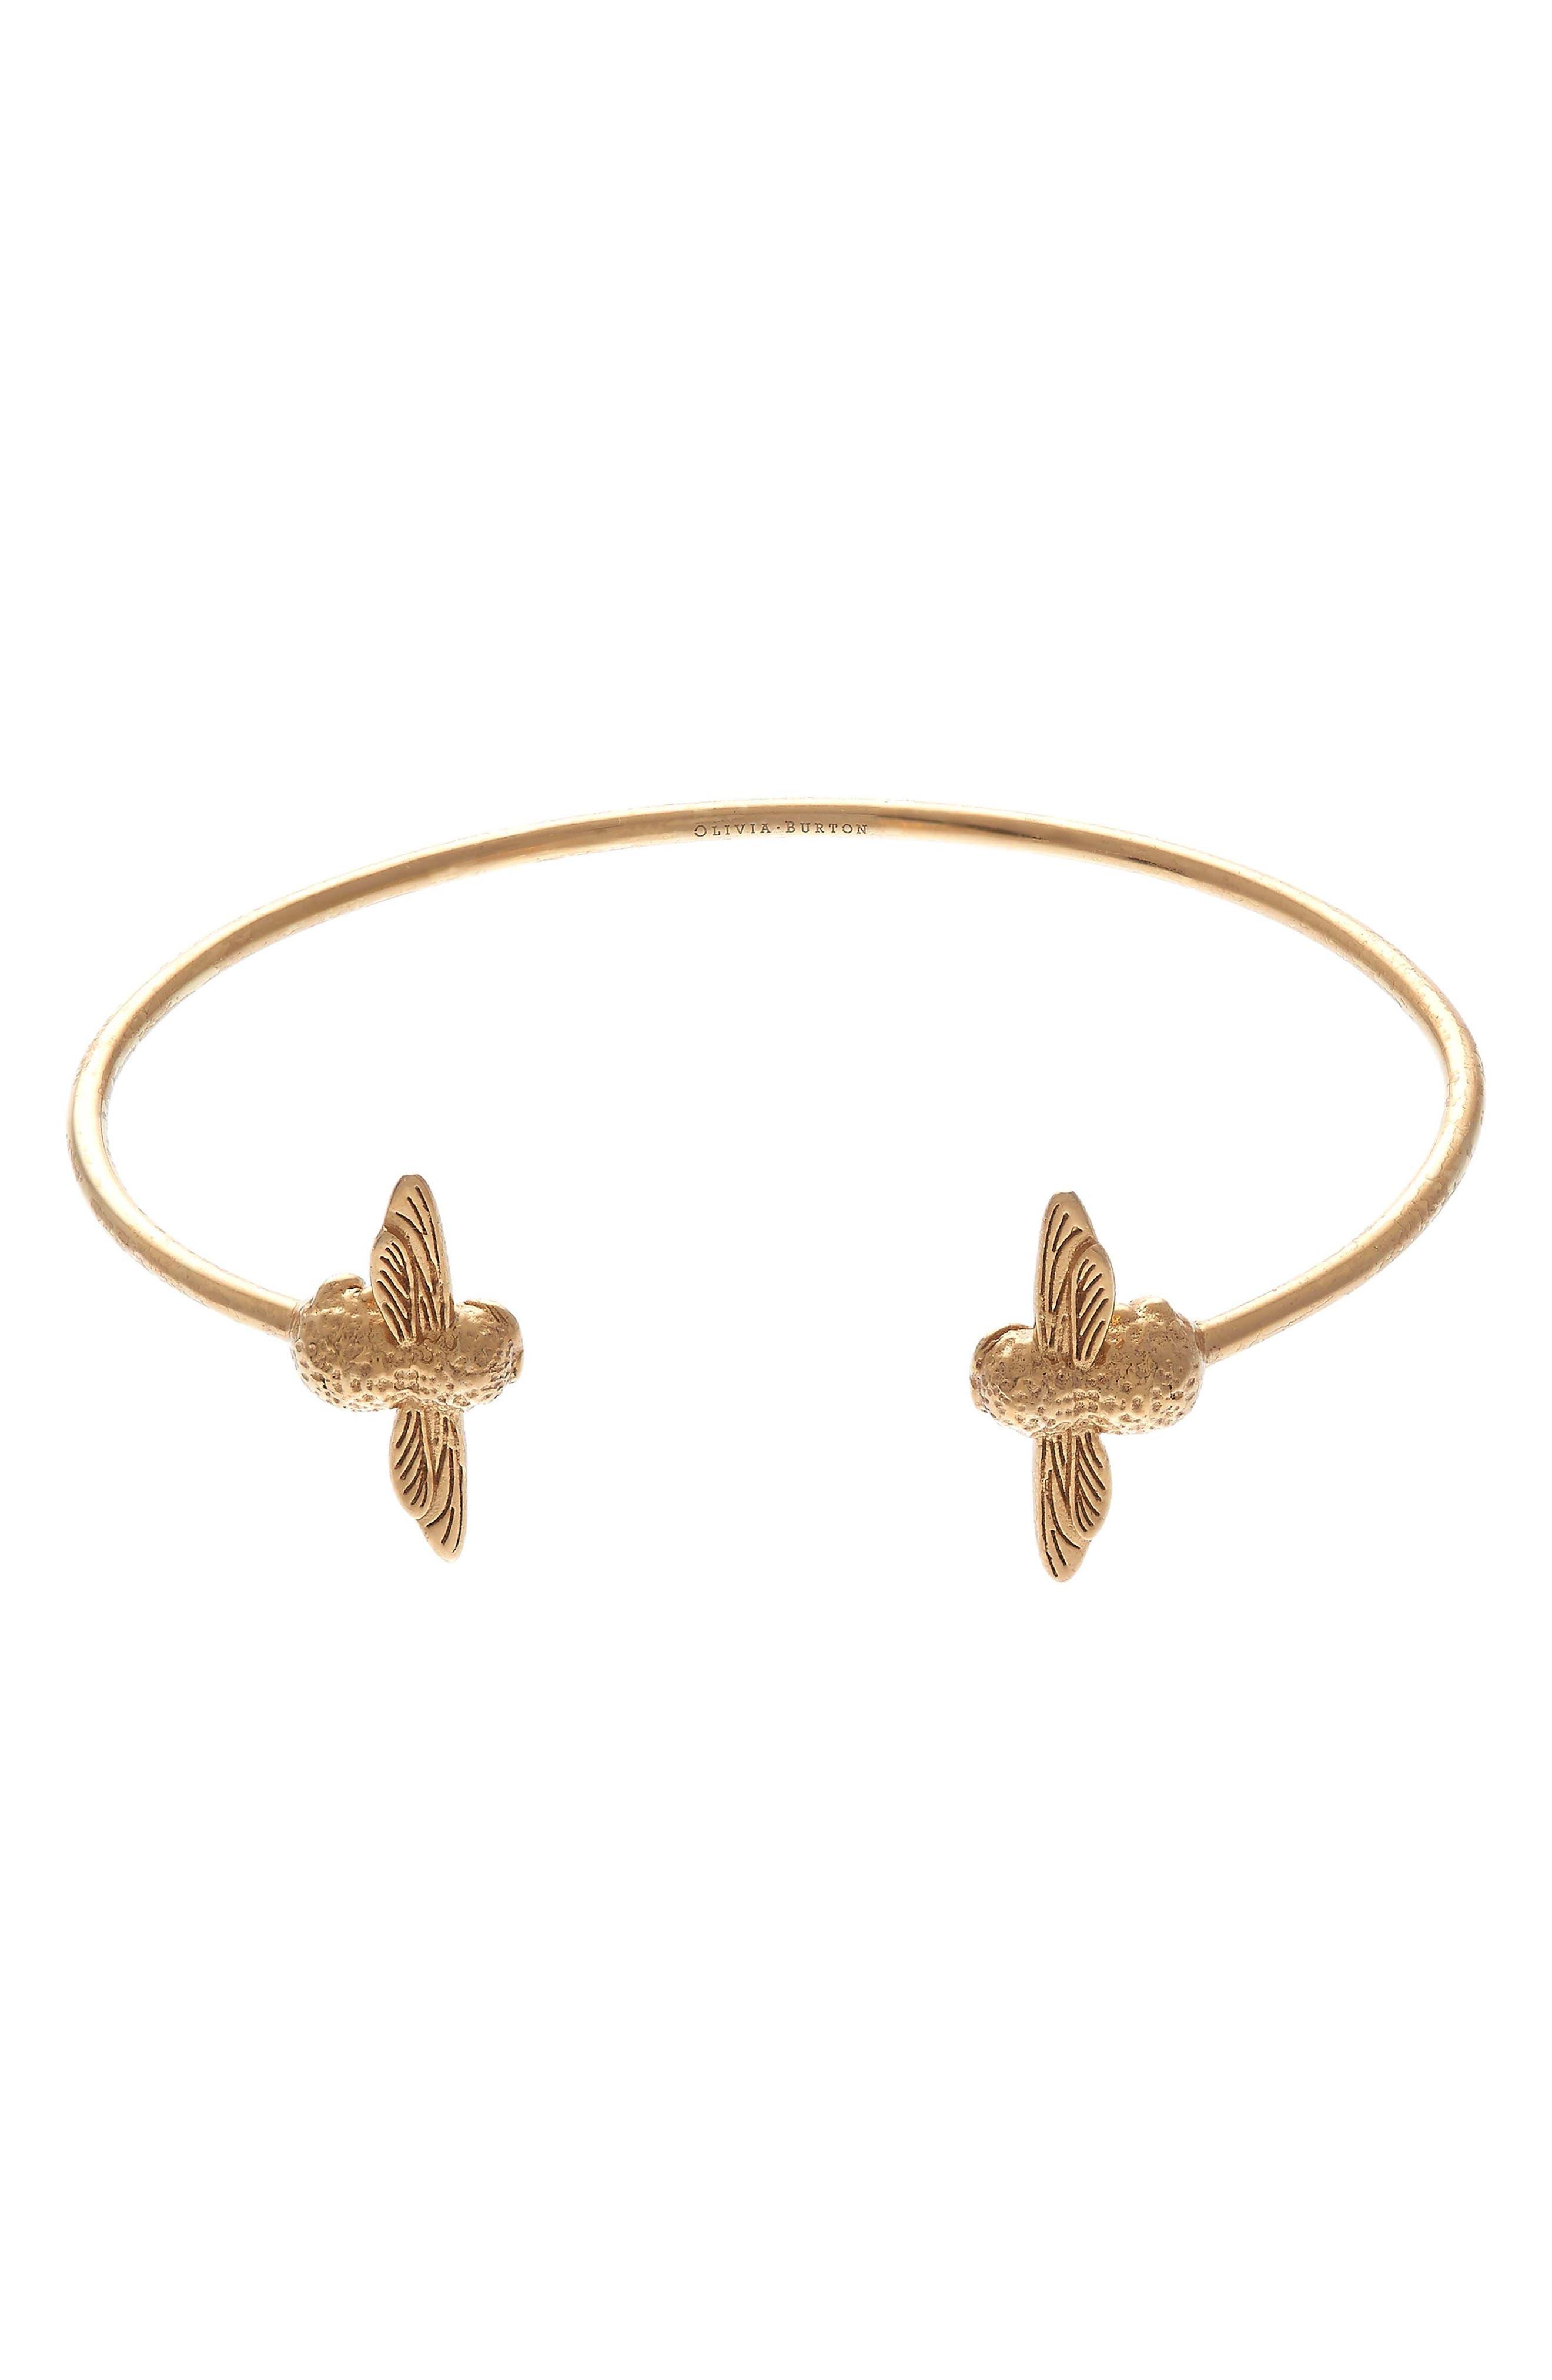 3D Bee Open Bangle Bracelet,                         Main,                         color, Gold